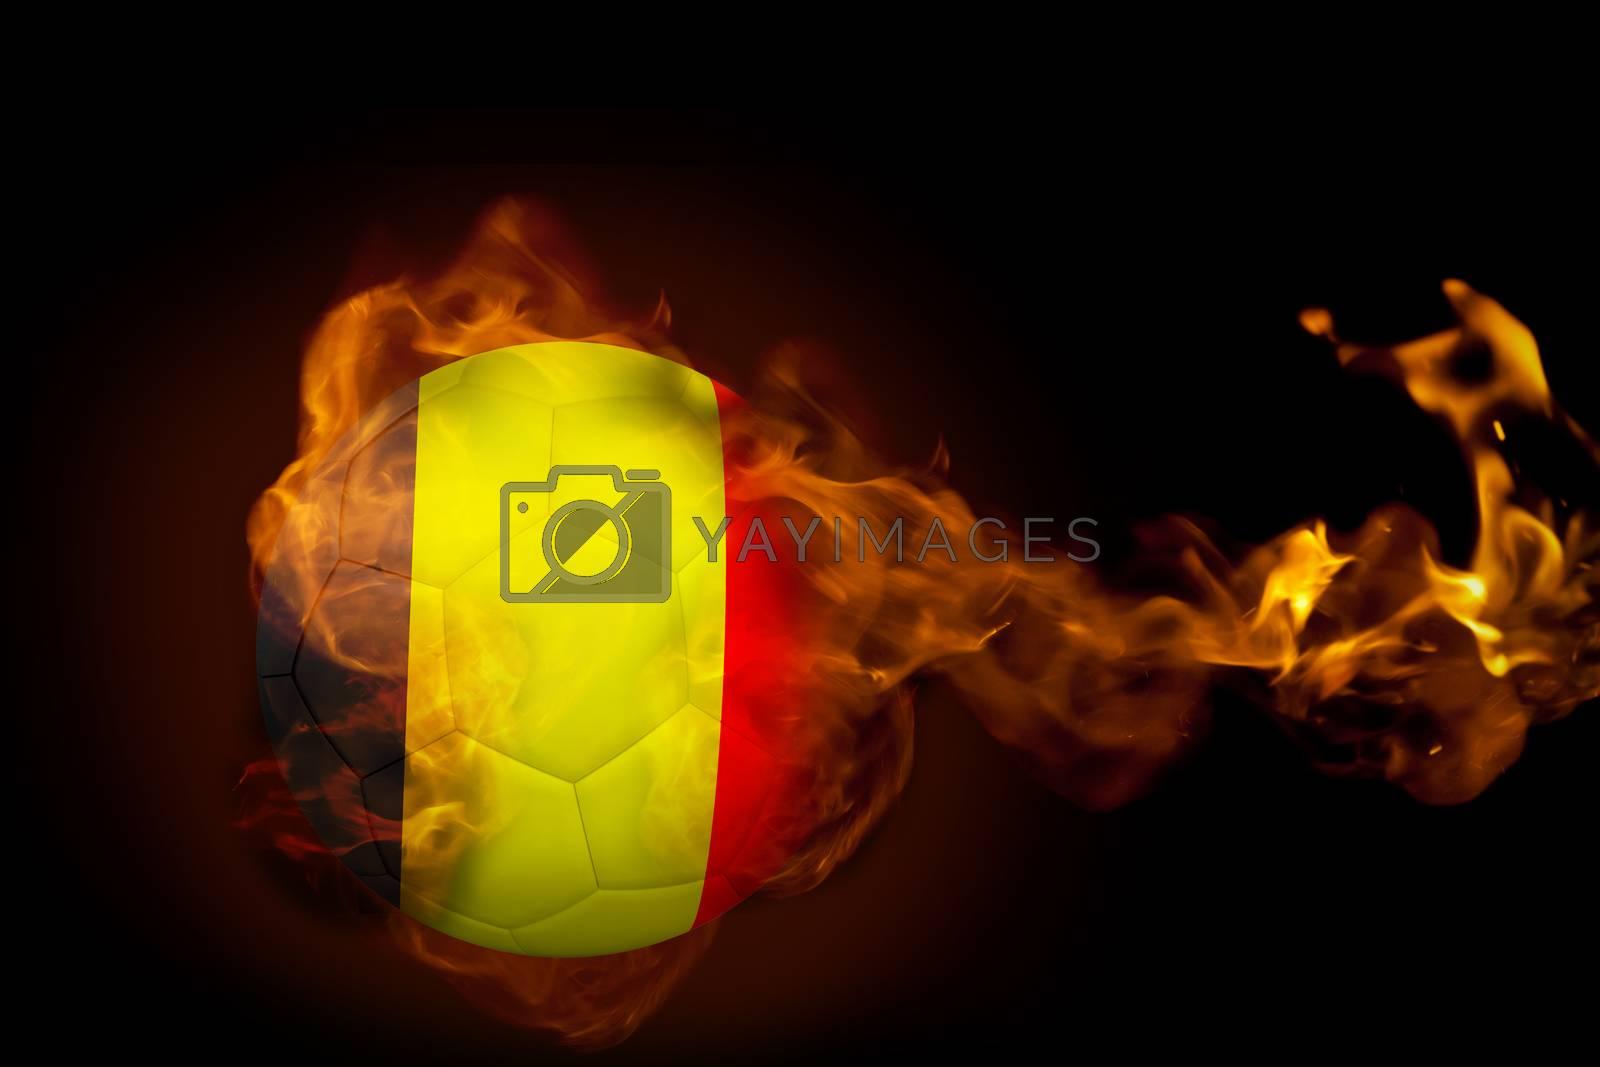 Fire surrounding belgium ball by Wavebreakmedia